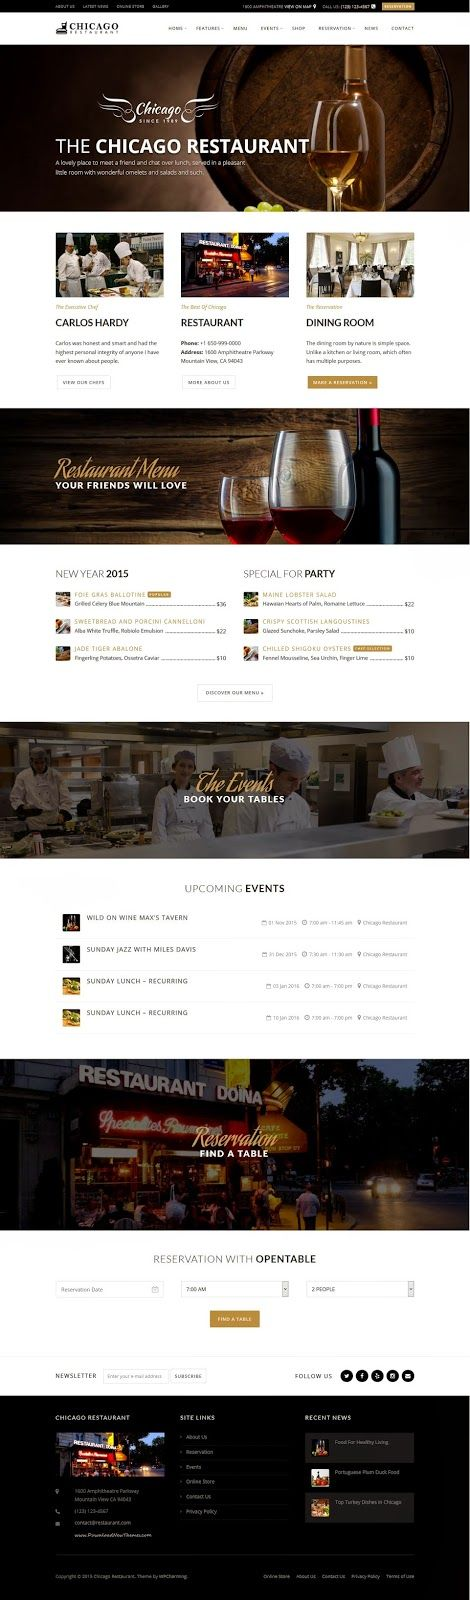 Versatile Restaurant and Cafe WordPress Themes 2015 #bar #bistro #website